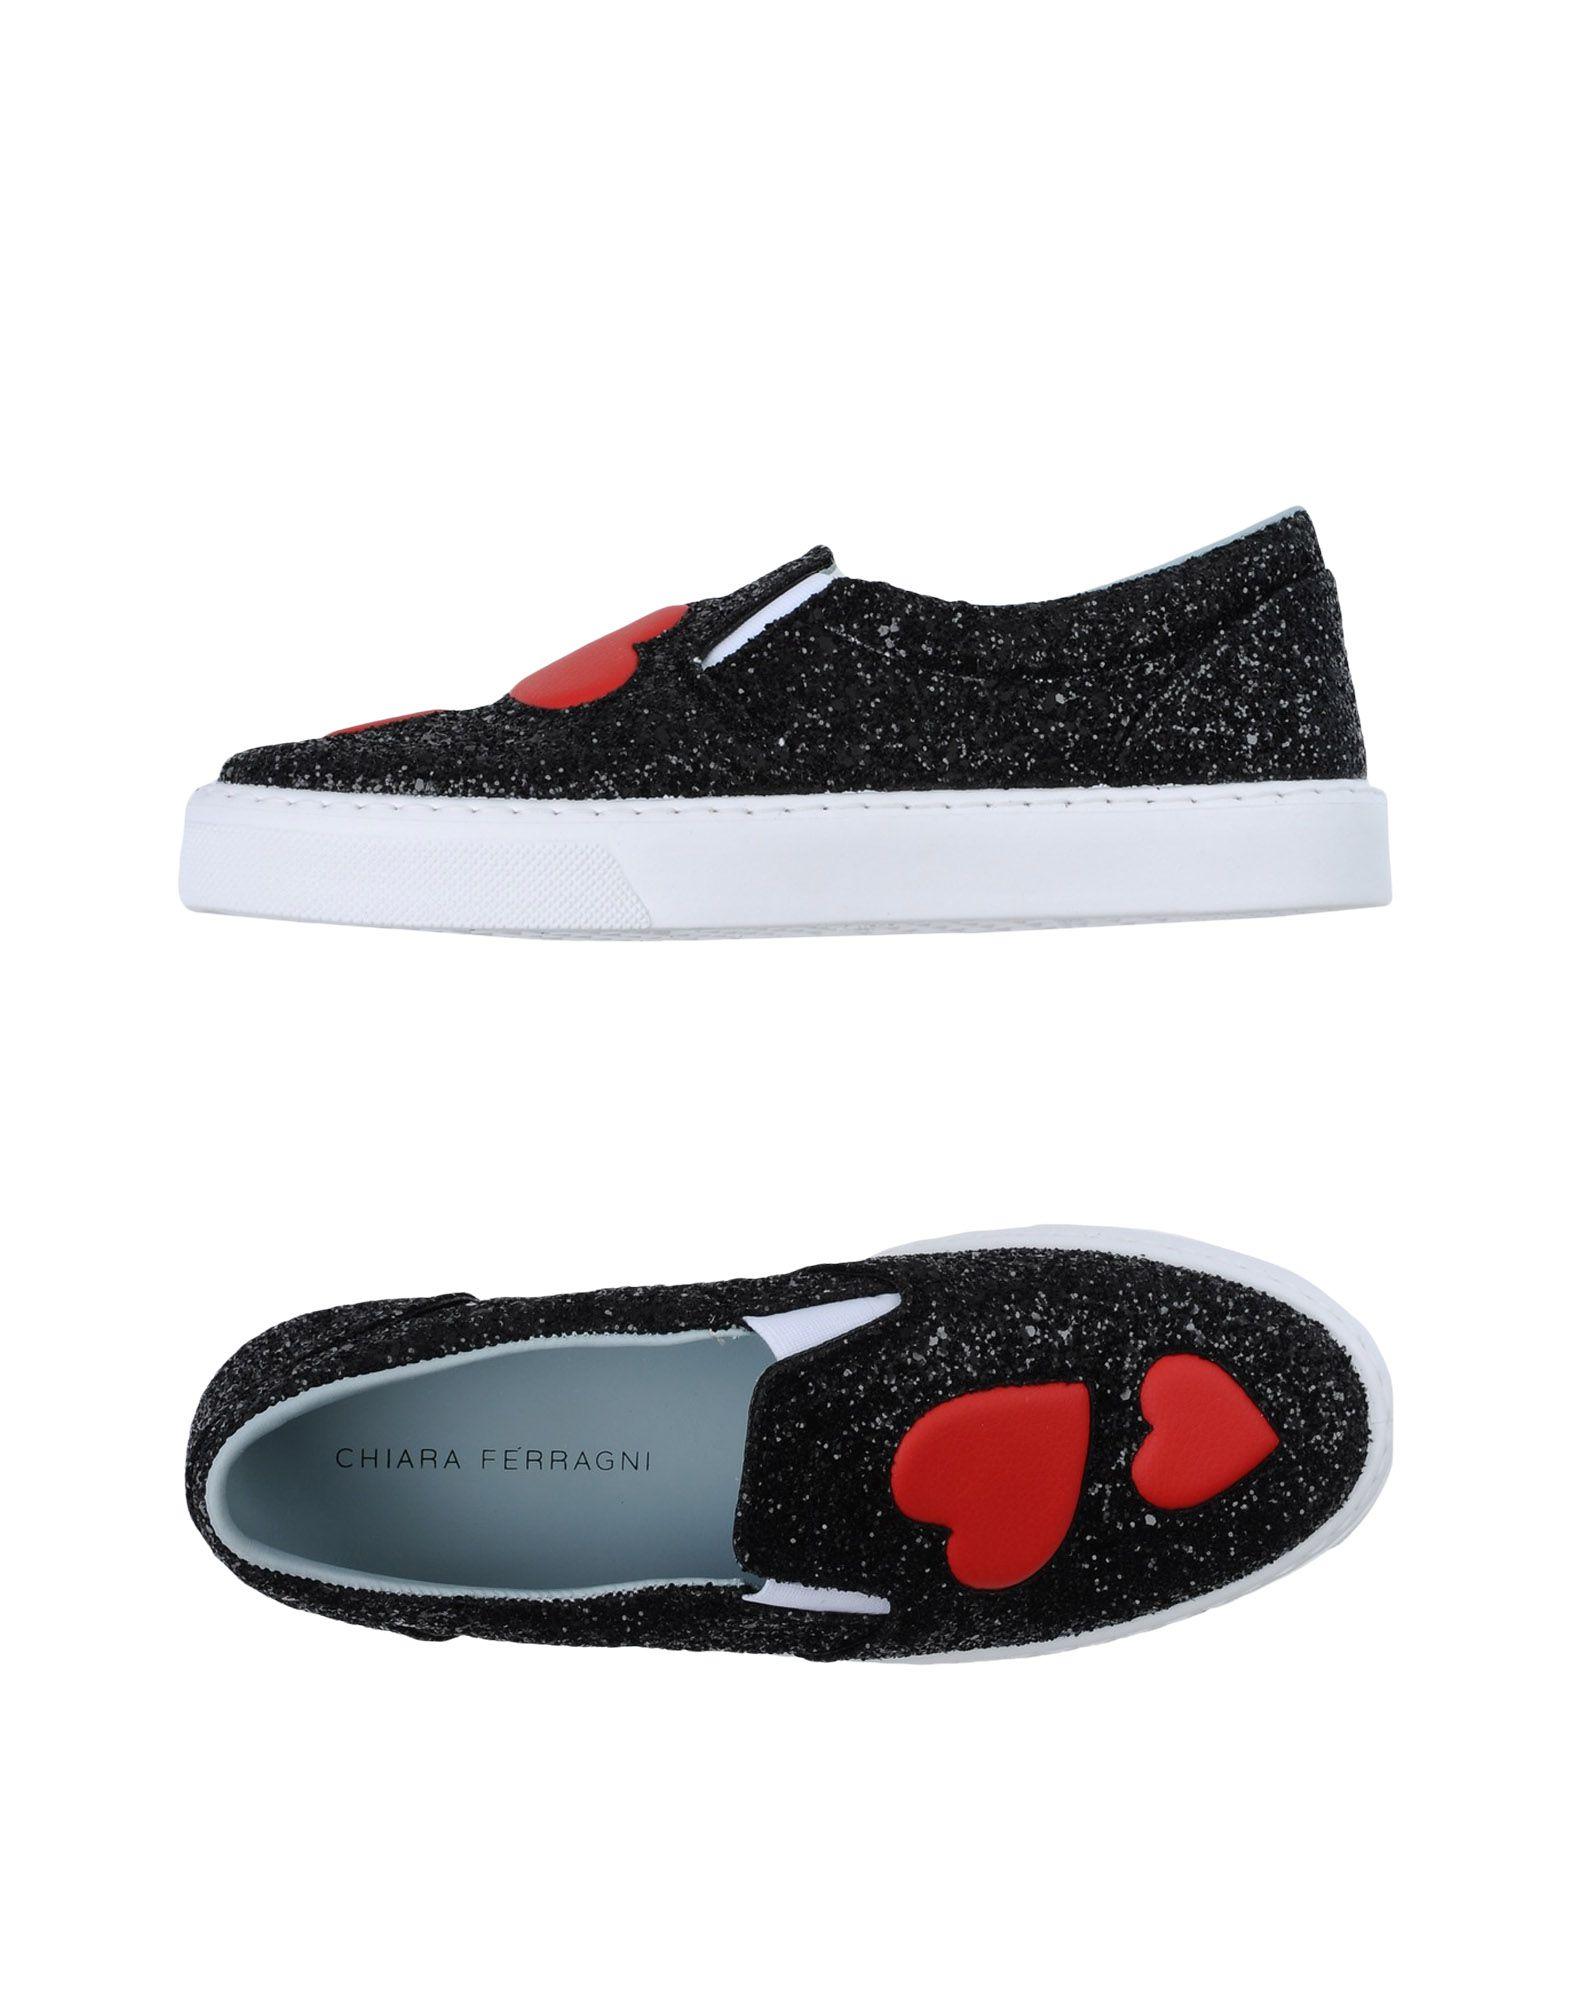 Chiara 11339485NP Ferragni Sneakers Damen  11339485NP Chiara Gute Qualität beliebte Schuhe 956e6a